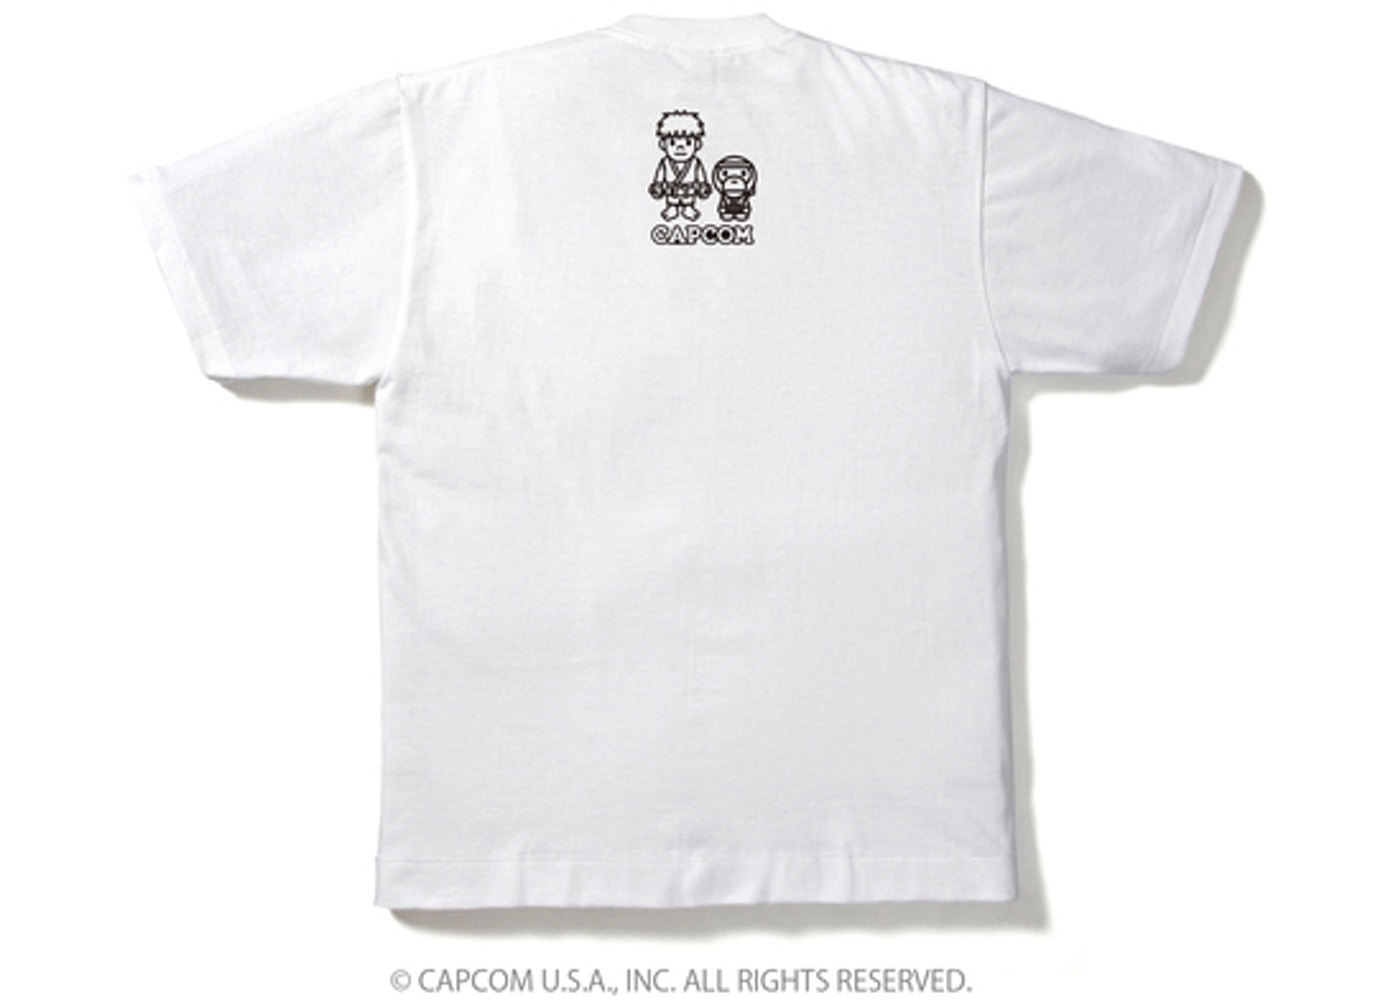 5f9f7dae0 Streetwear - Bape T-Shirts - Highest Bid